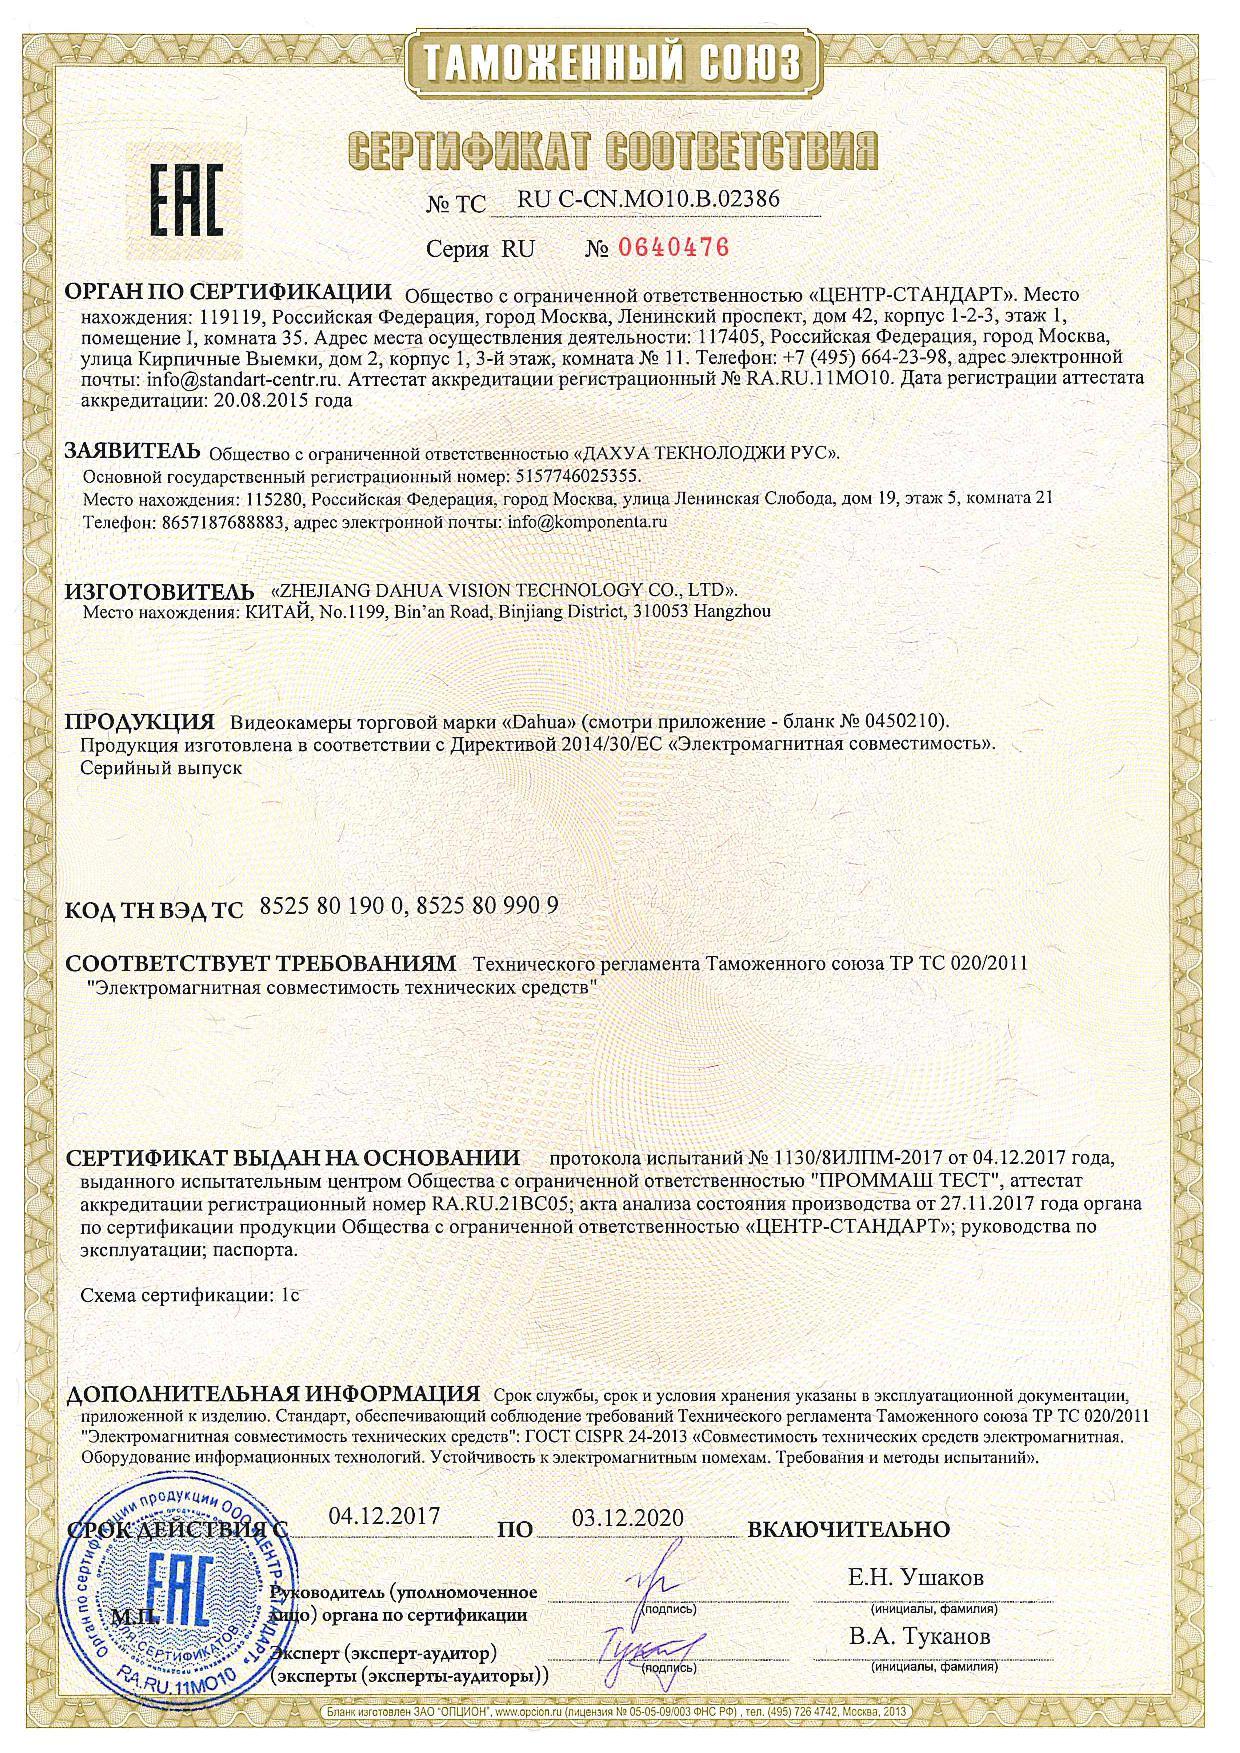 Сертификат Dahua - Видеокамеры